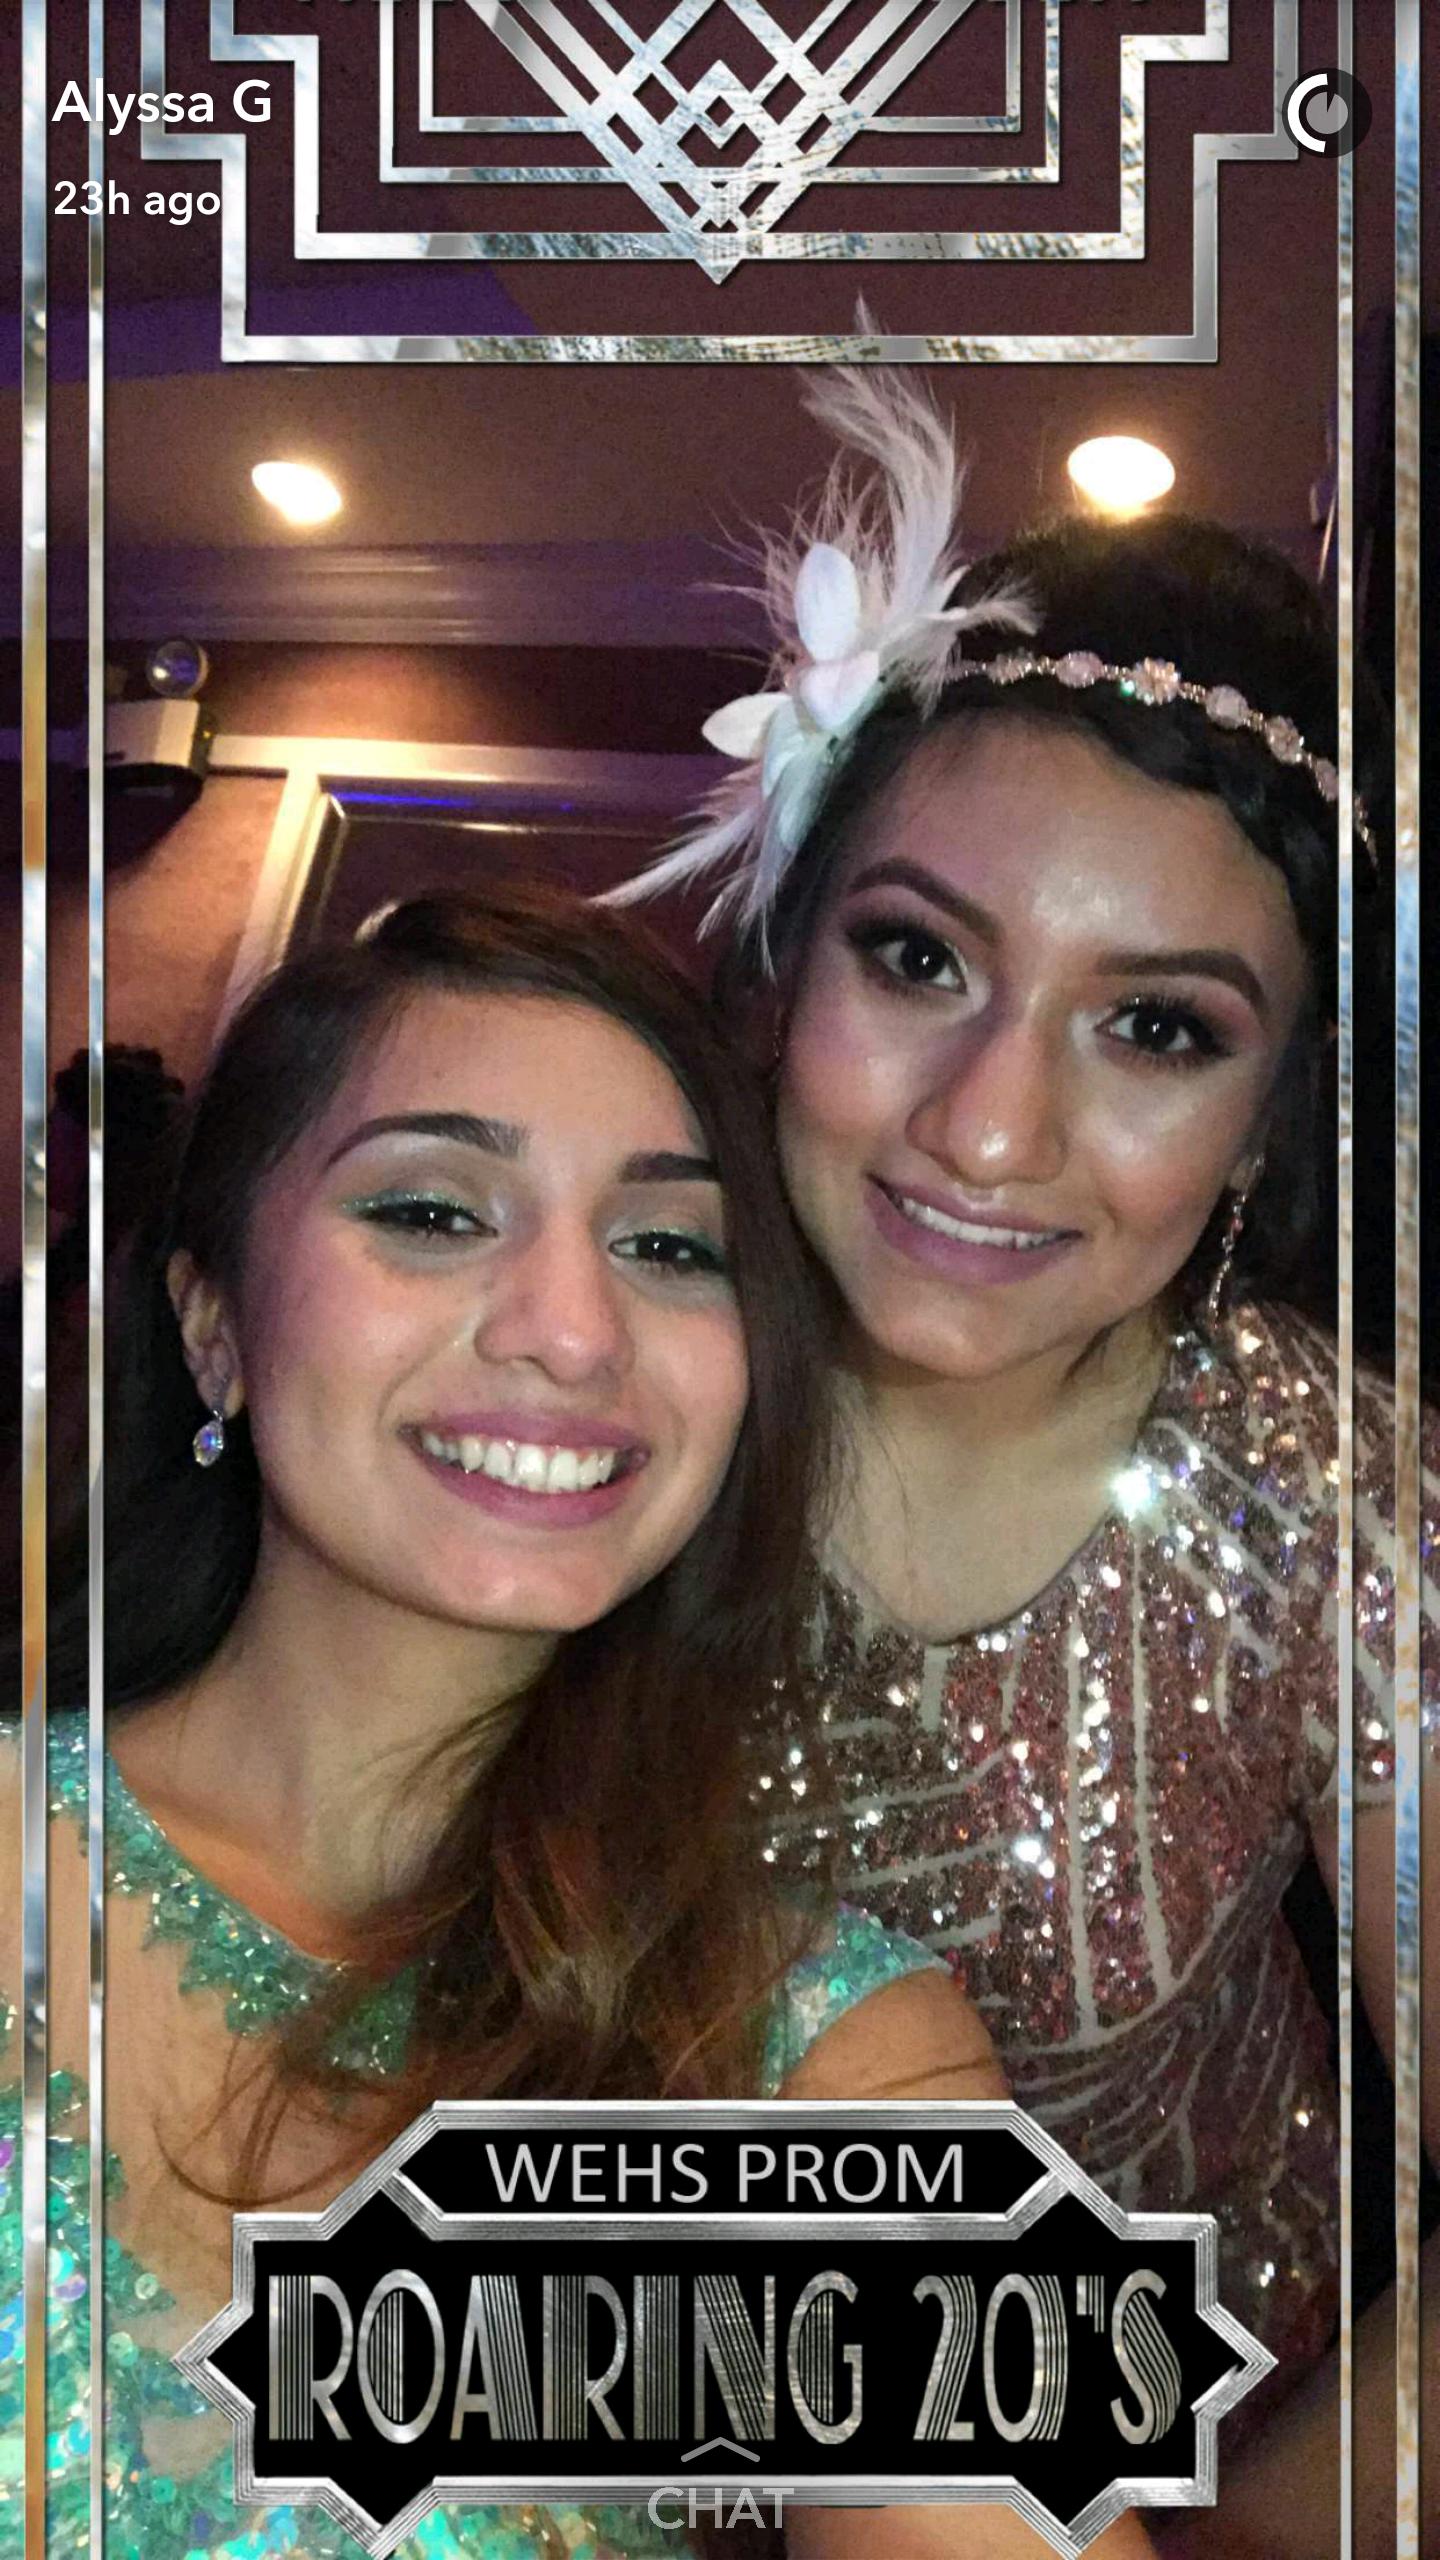 Roaring 20s Prom Snapchat Filter